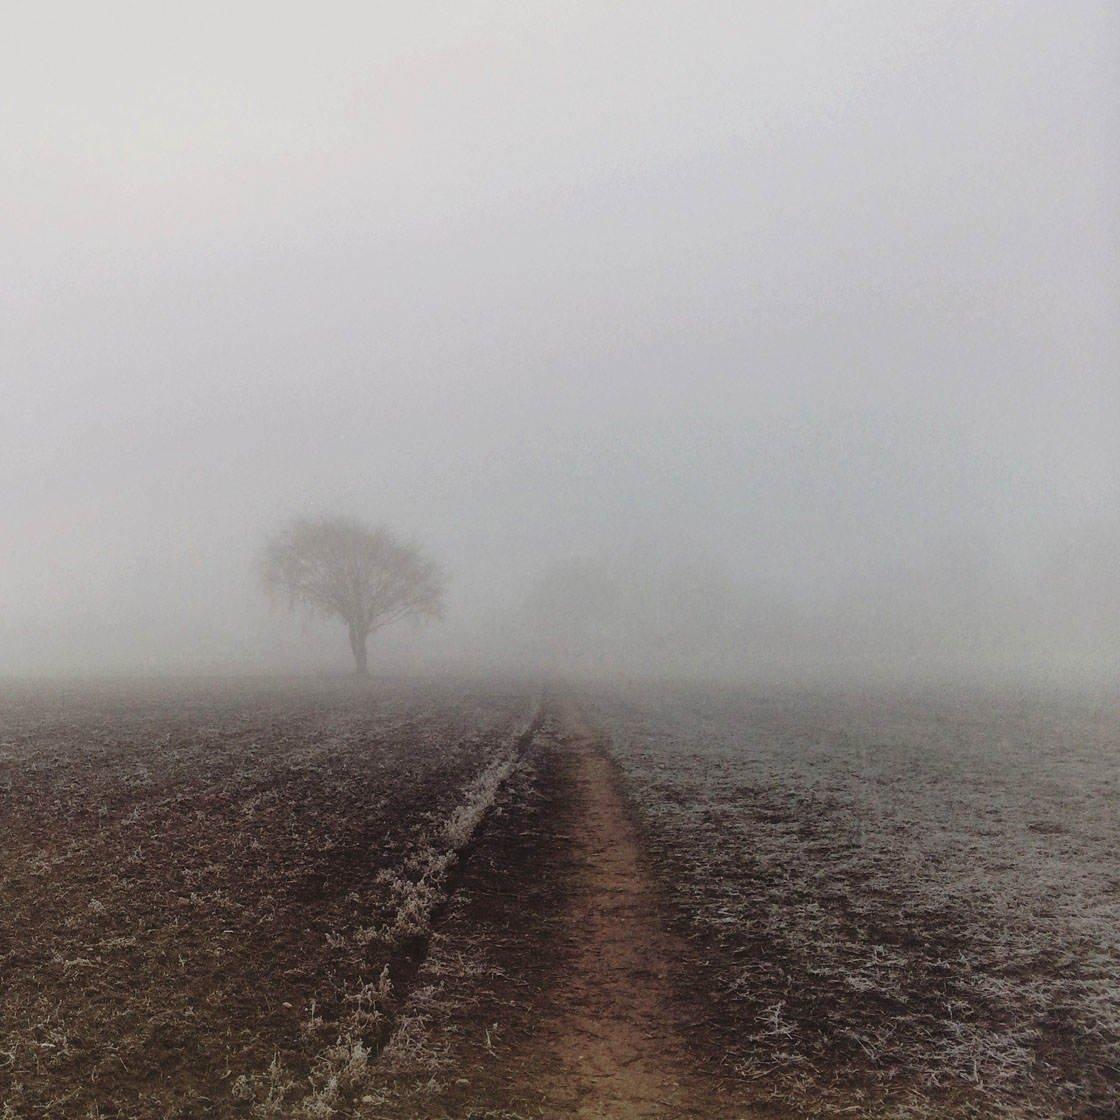 Fog & Mist iPhone Photos 21 no script